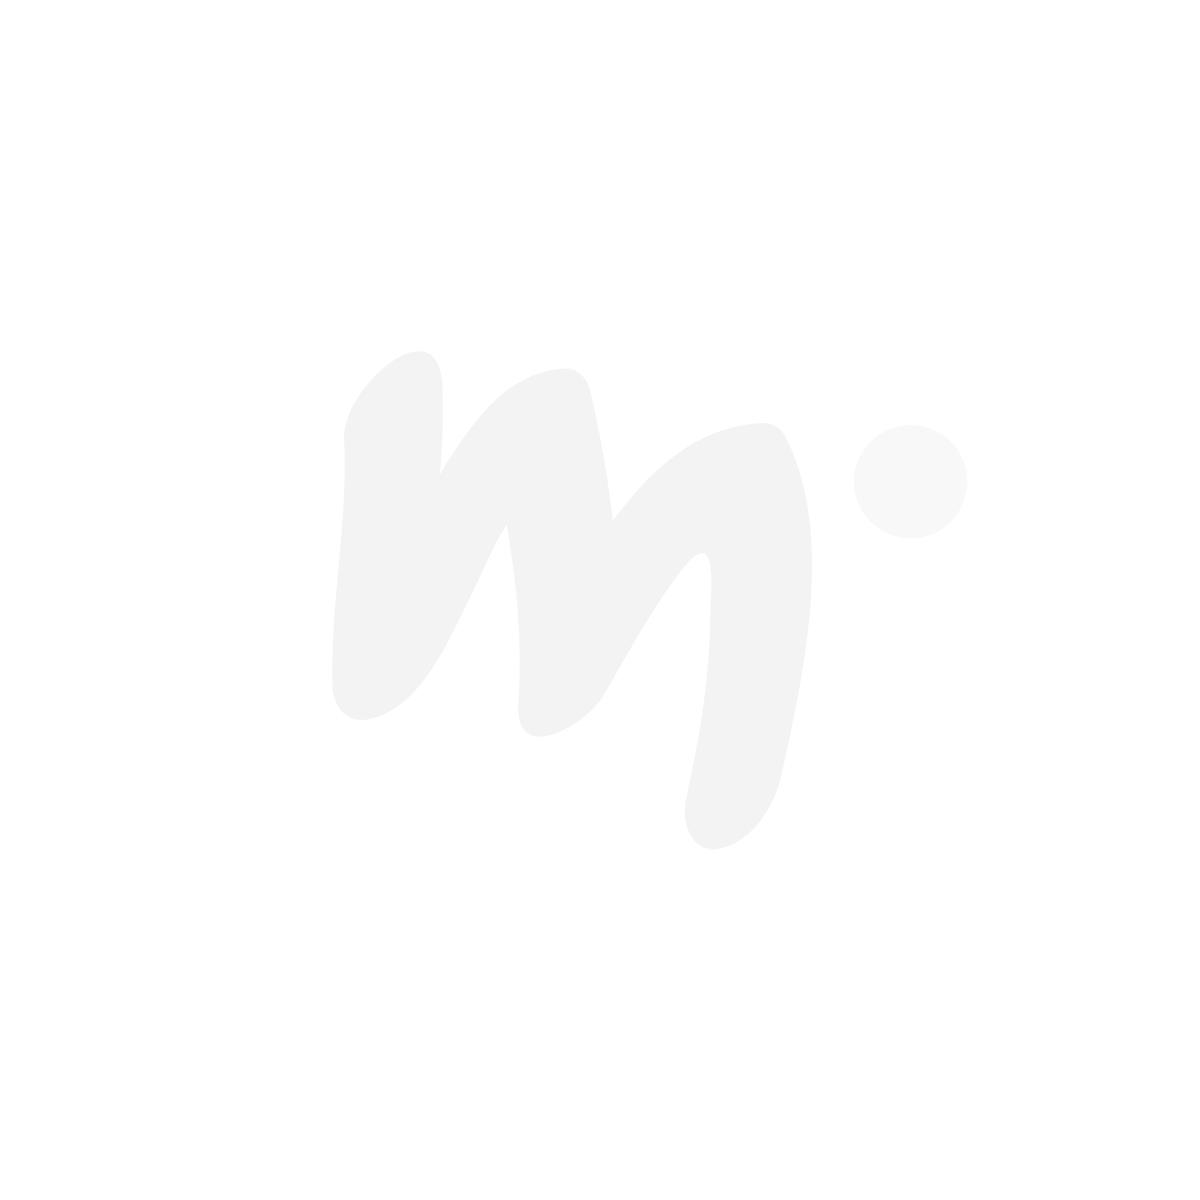 Mx Deco Saaristotonttu valkoinen 30 cm